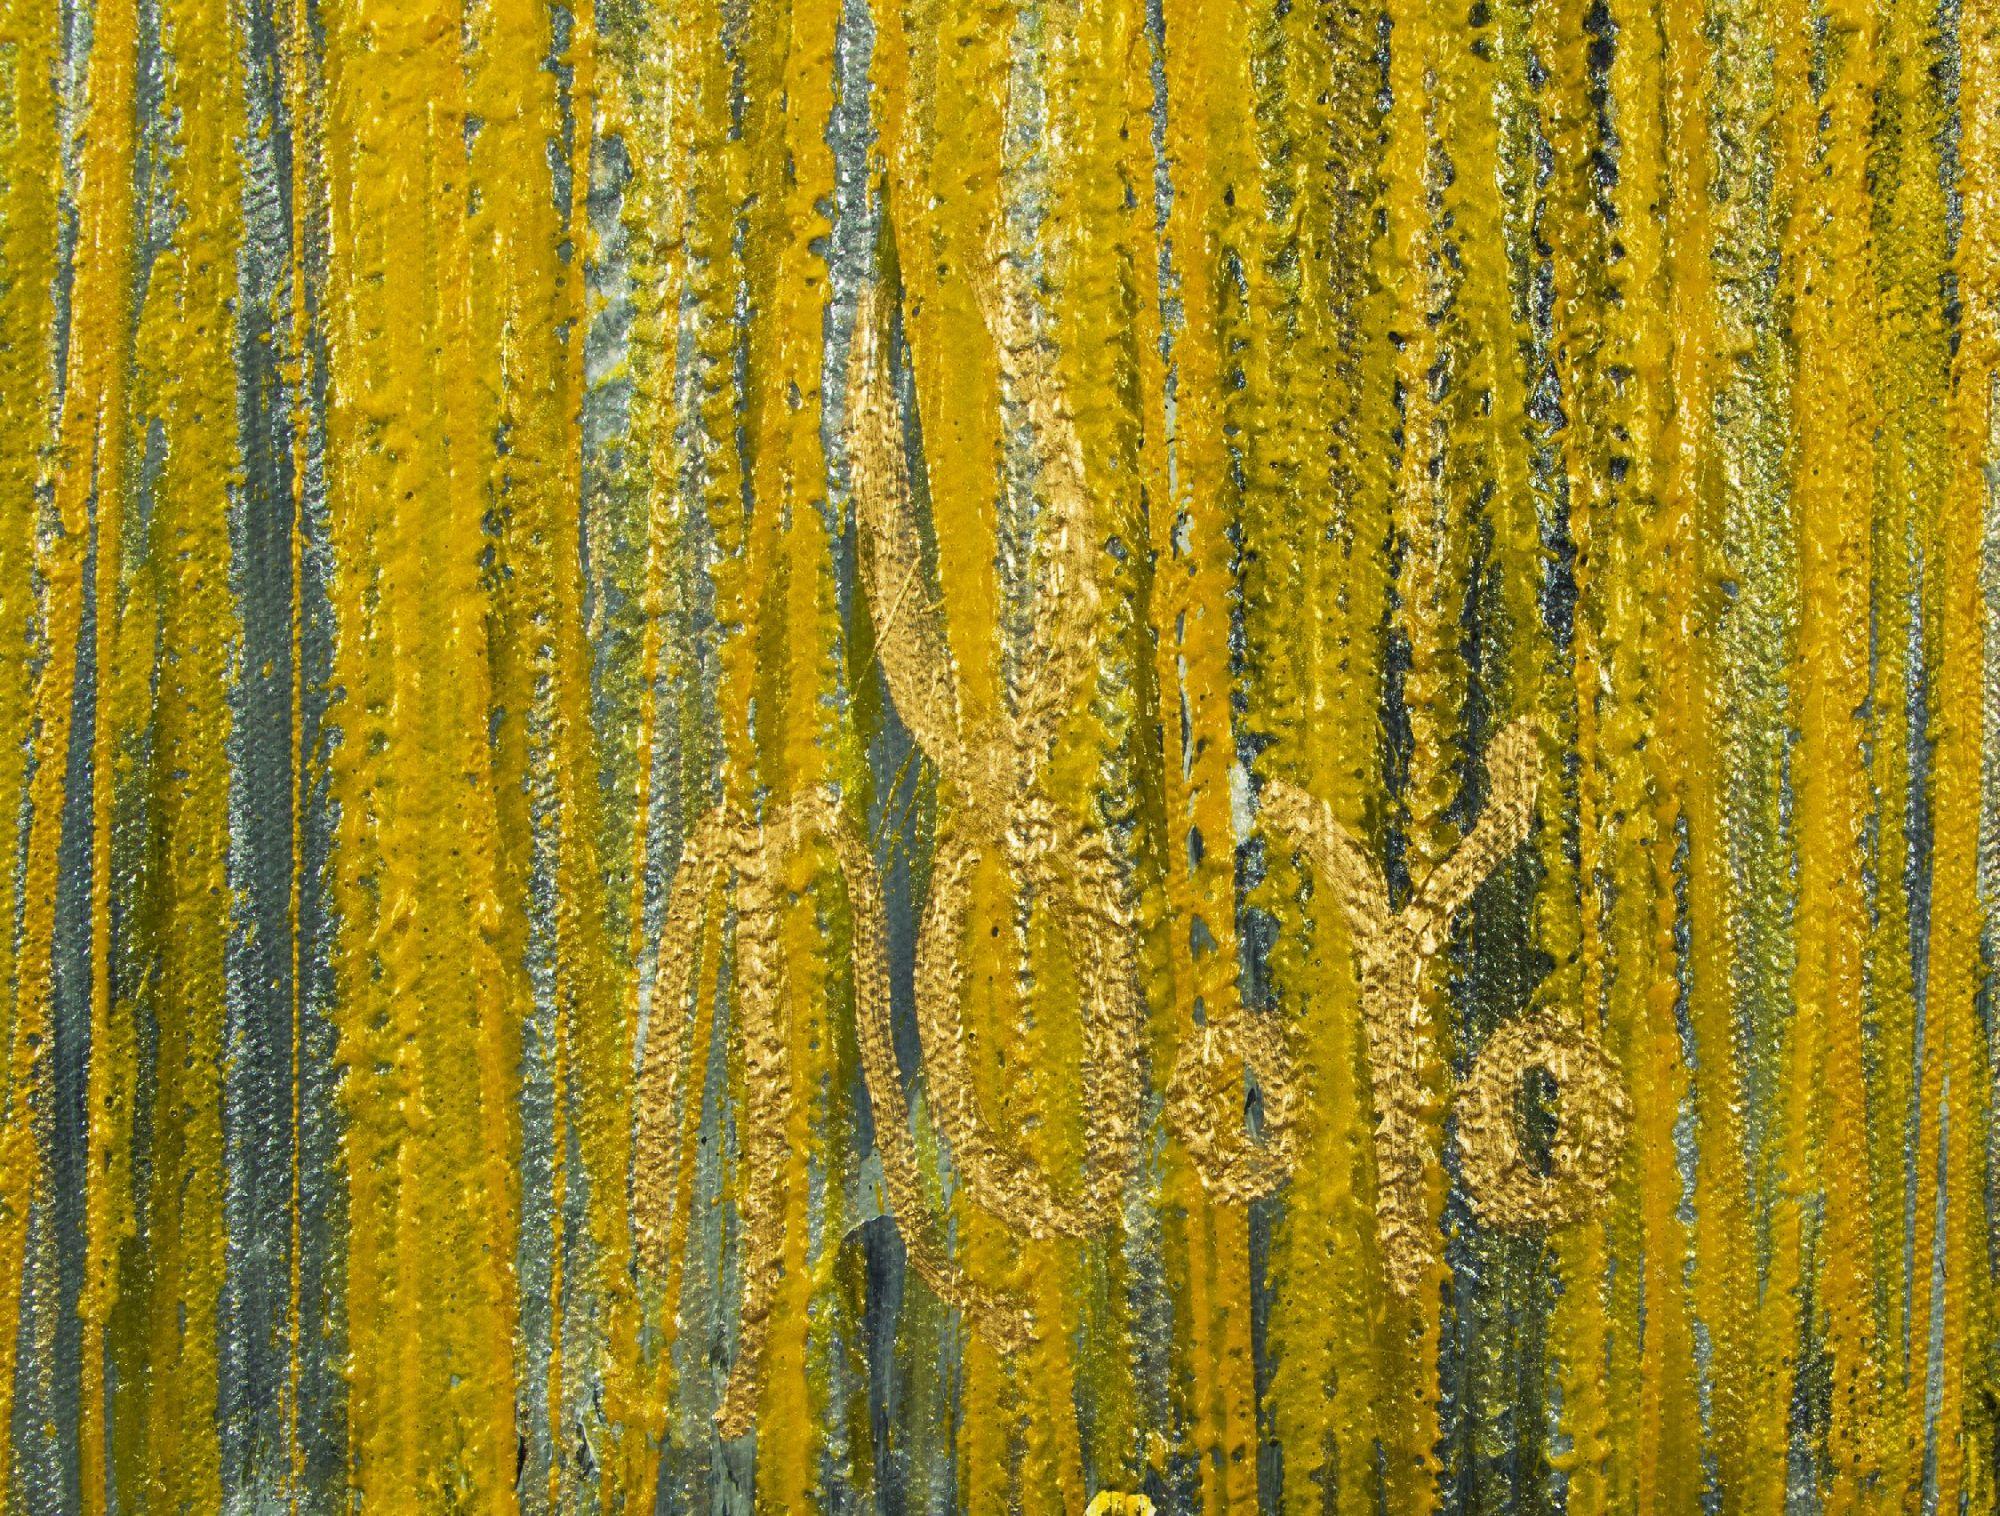 SOLD / Signature - Garden In Motion 4 (Autumn) (2020) by Nestor Toro